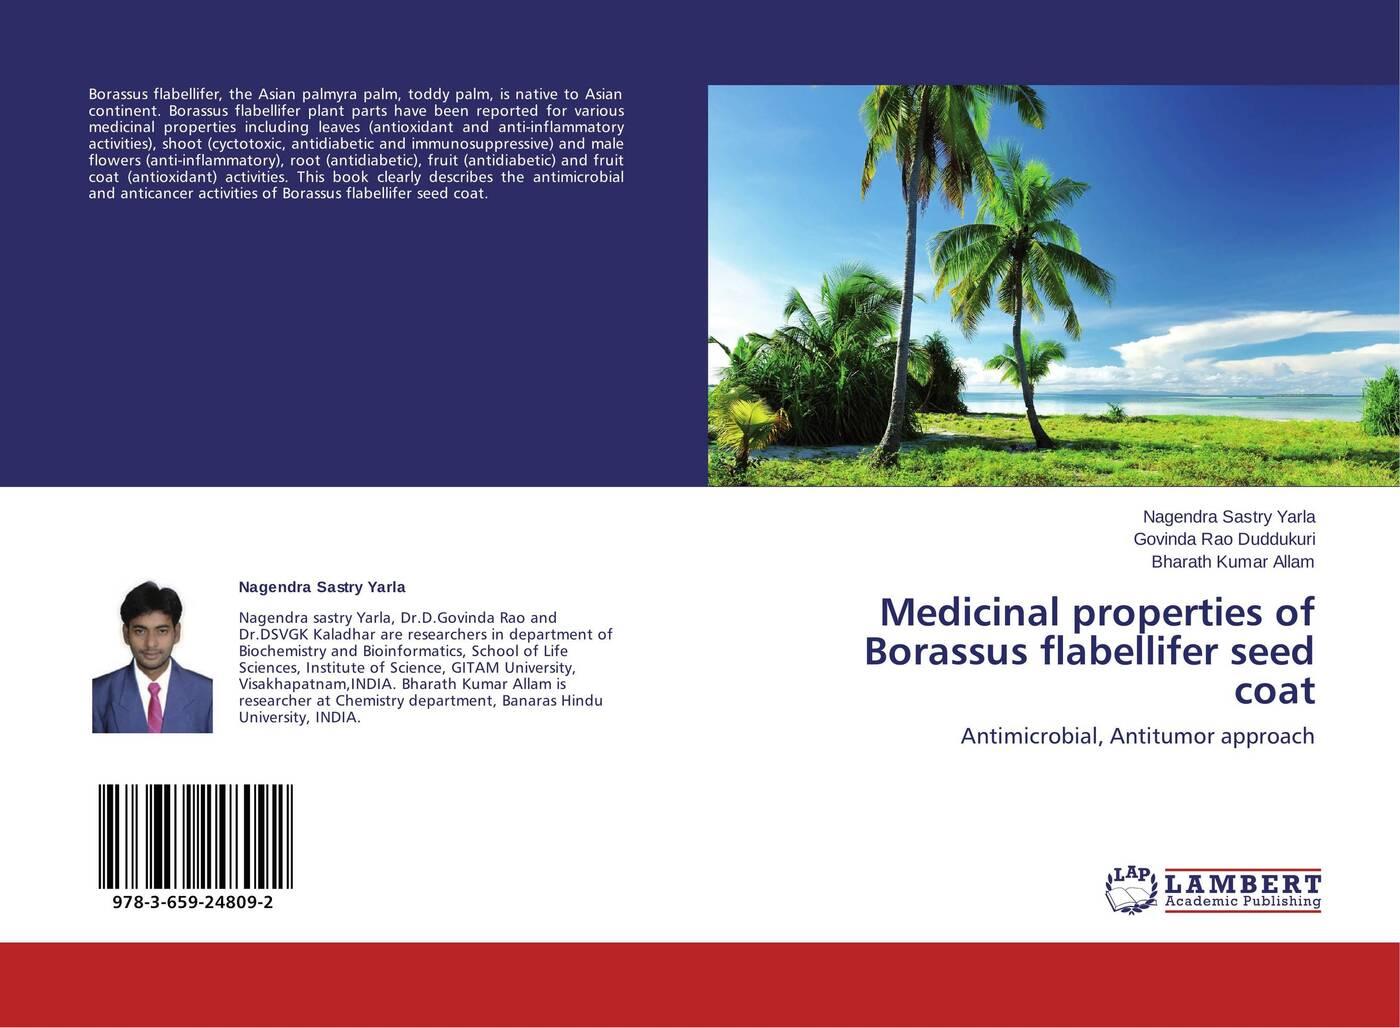 лучшая цена Nagendra Sastry Yarla,Govinda Rao Duddukuri and Bharath Kumar Allam Medicinal properties of Borassus flabellifer seed coat